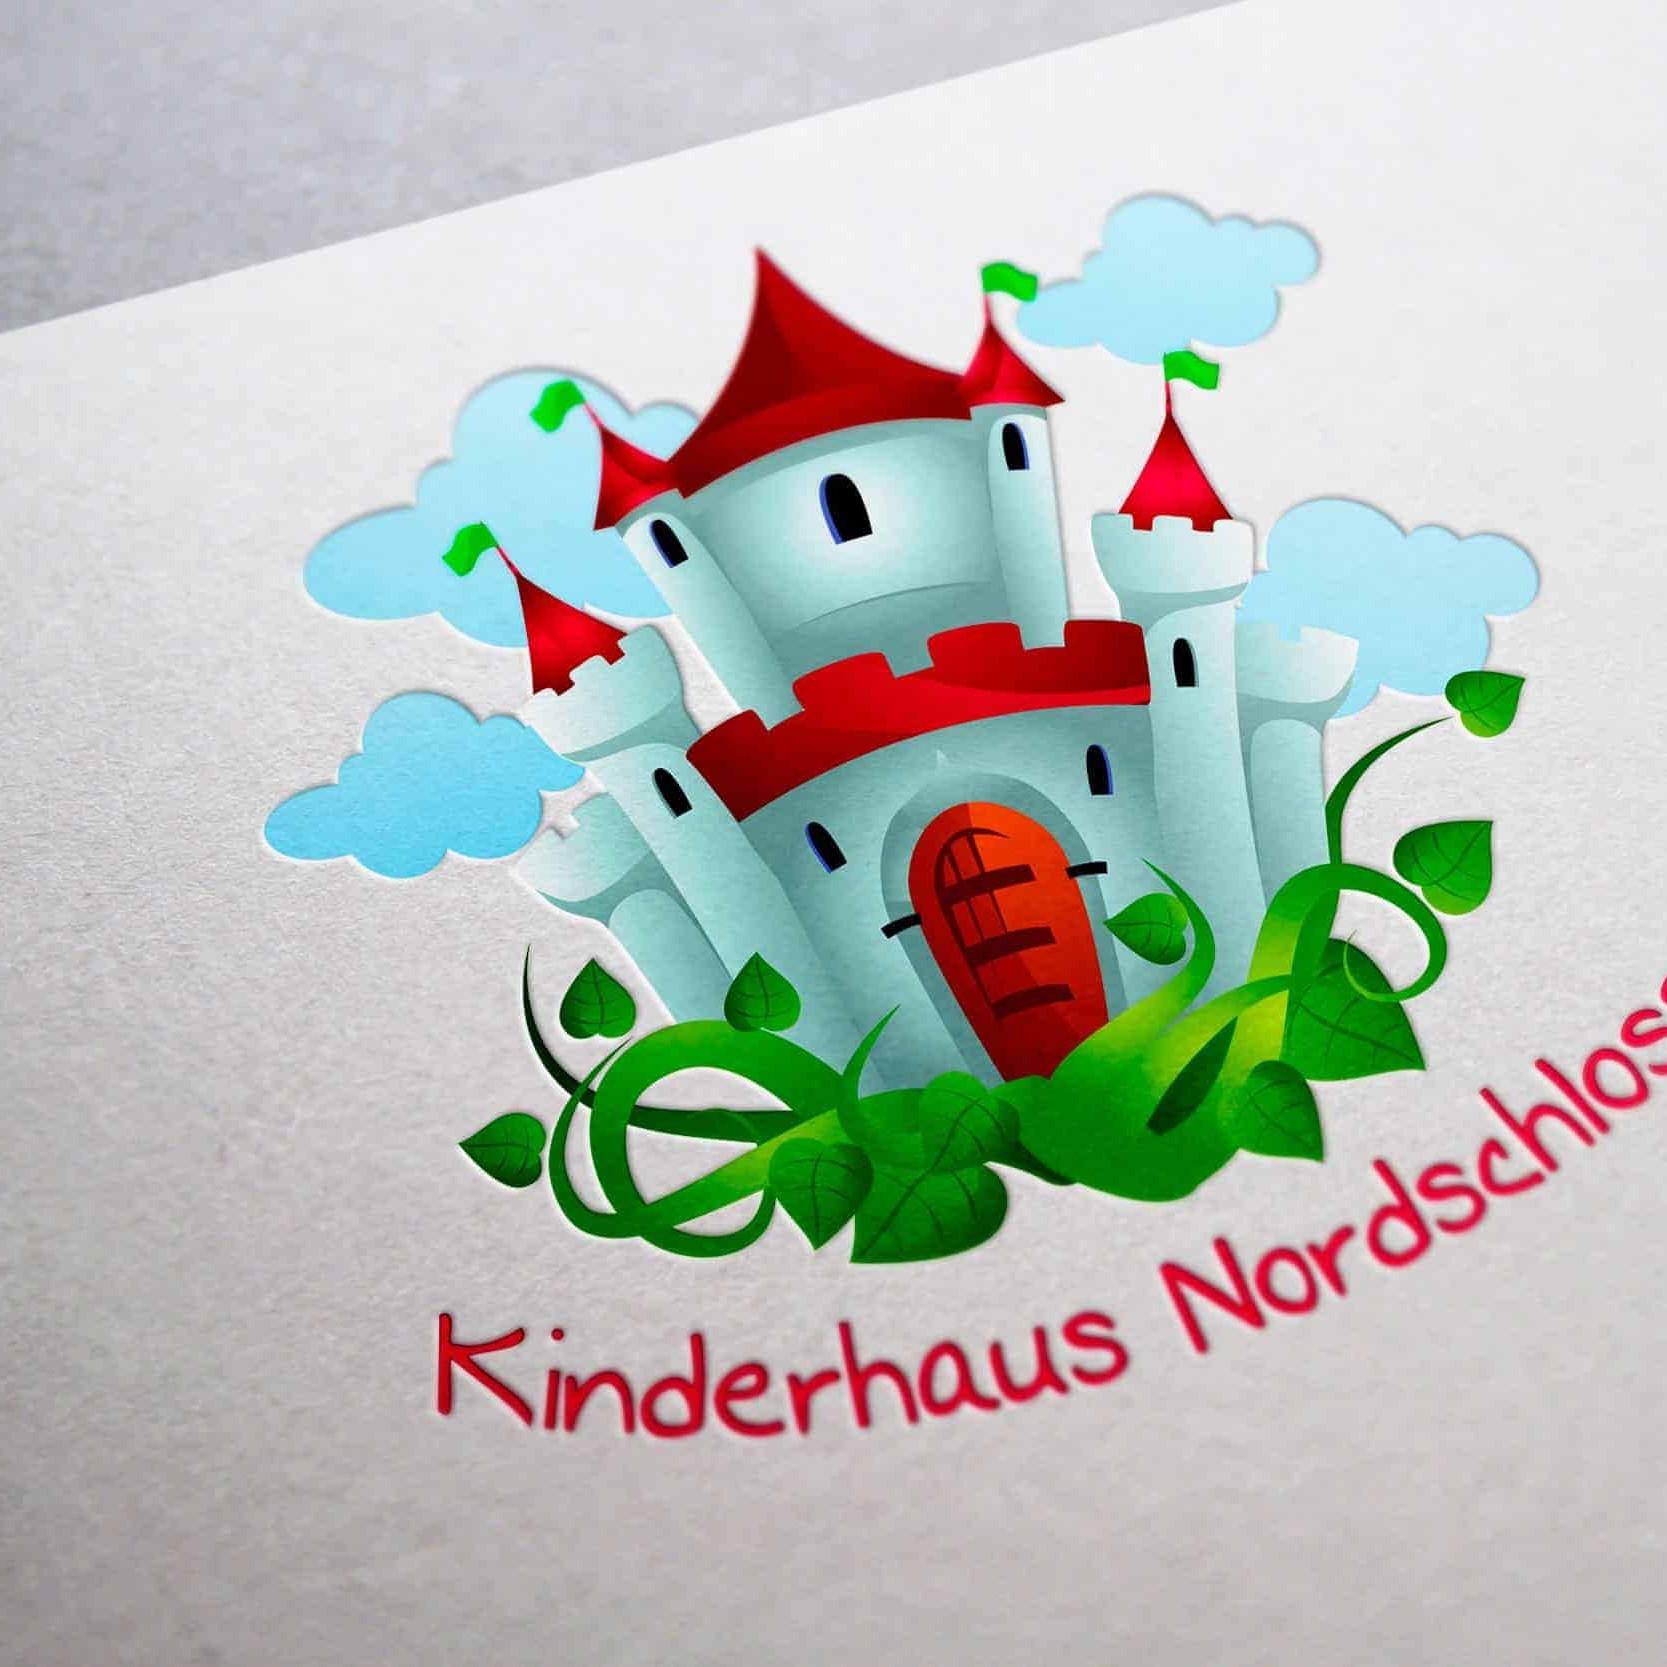 Logo Kinderhaus Nordschloss